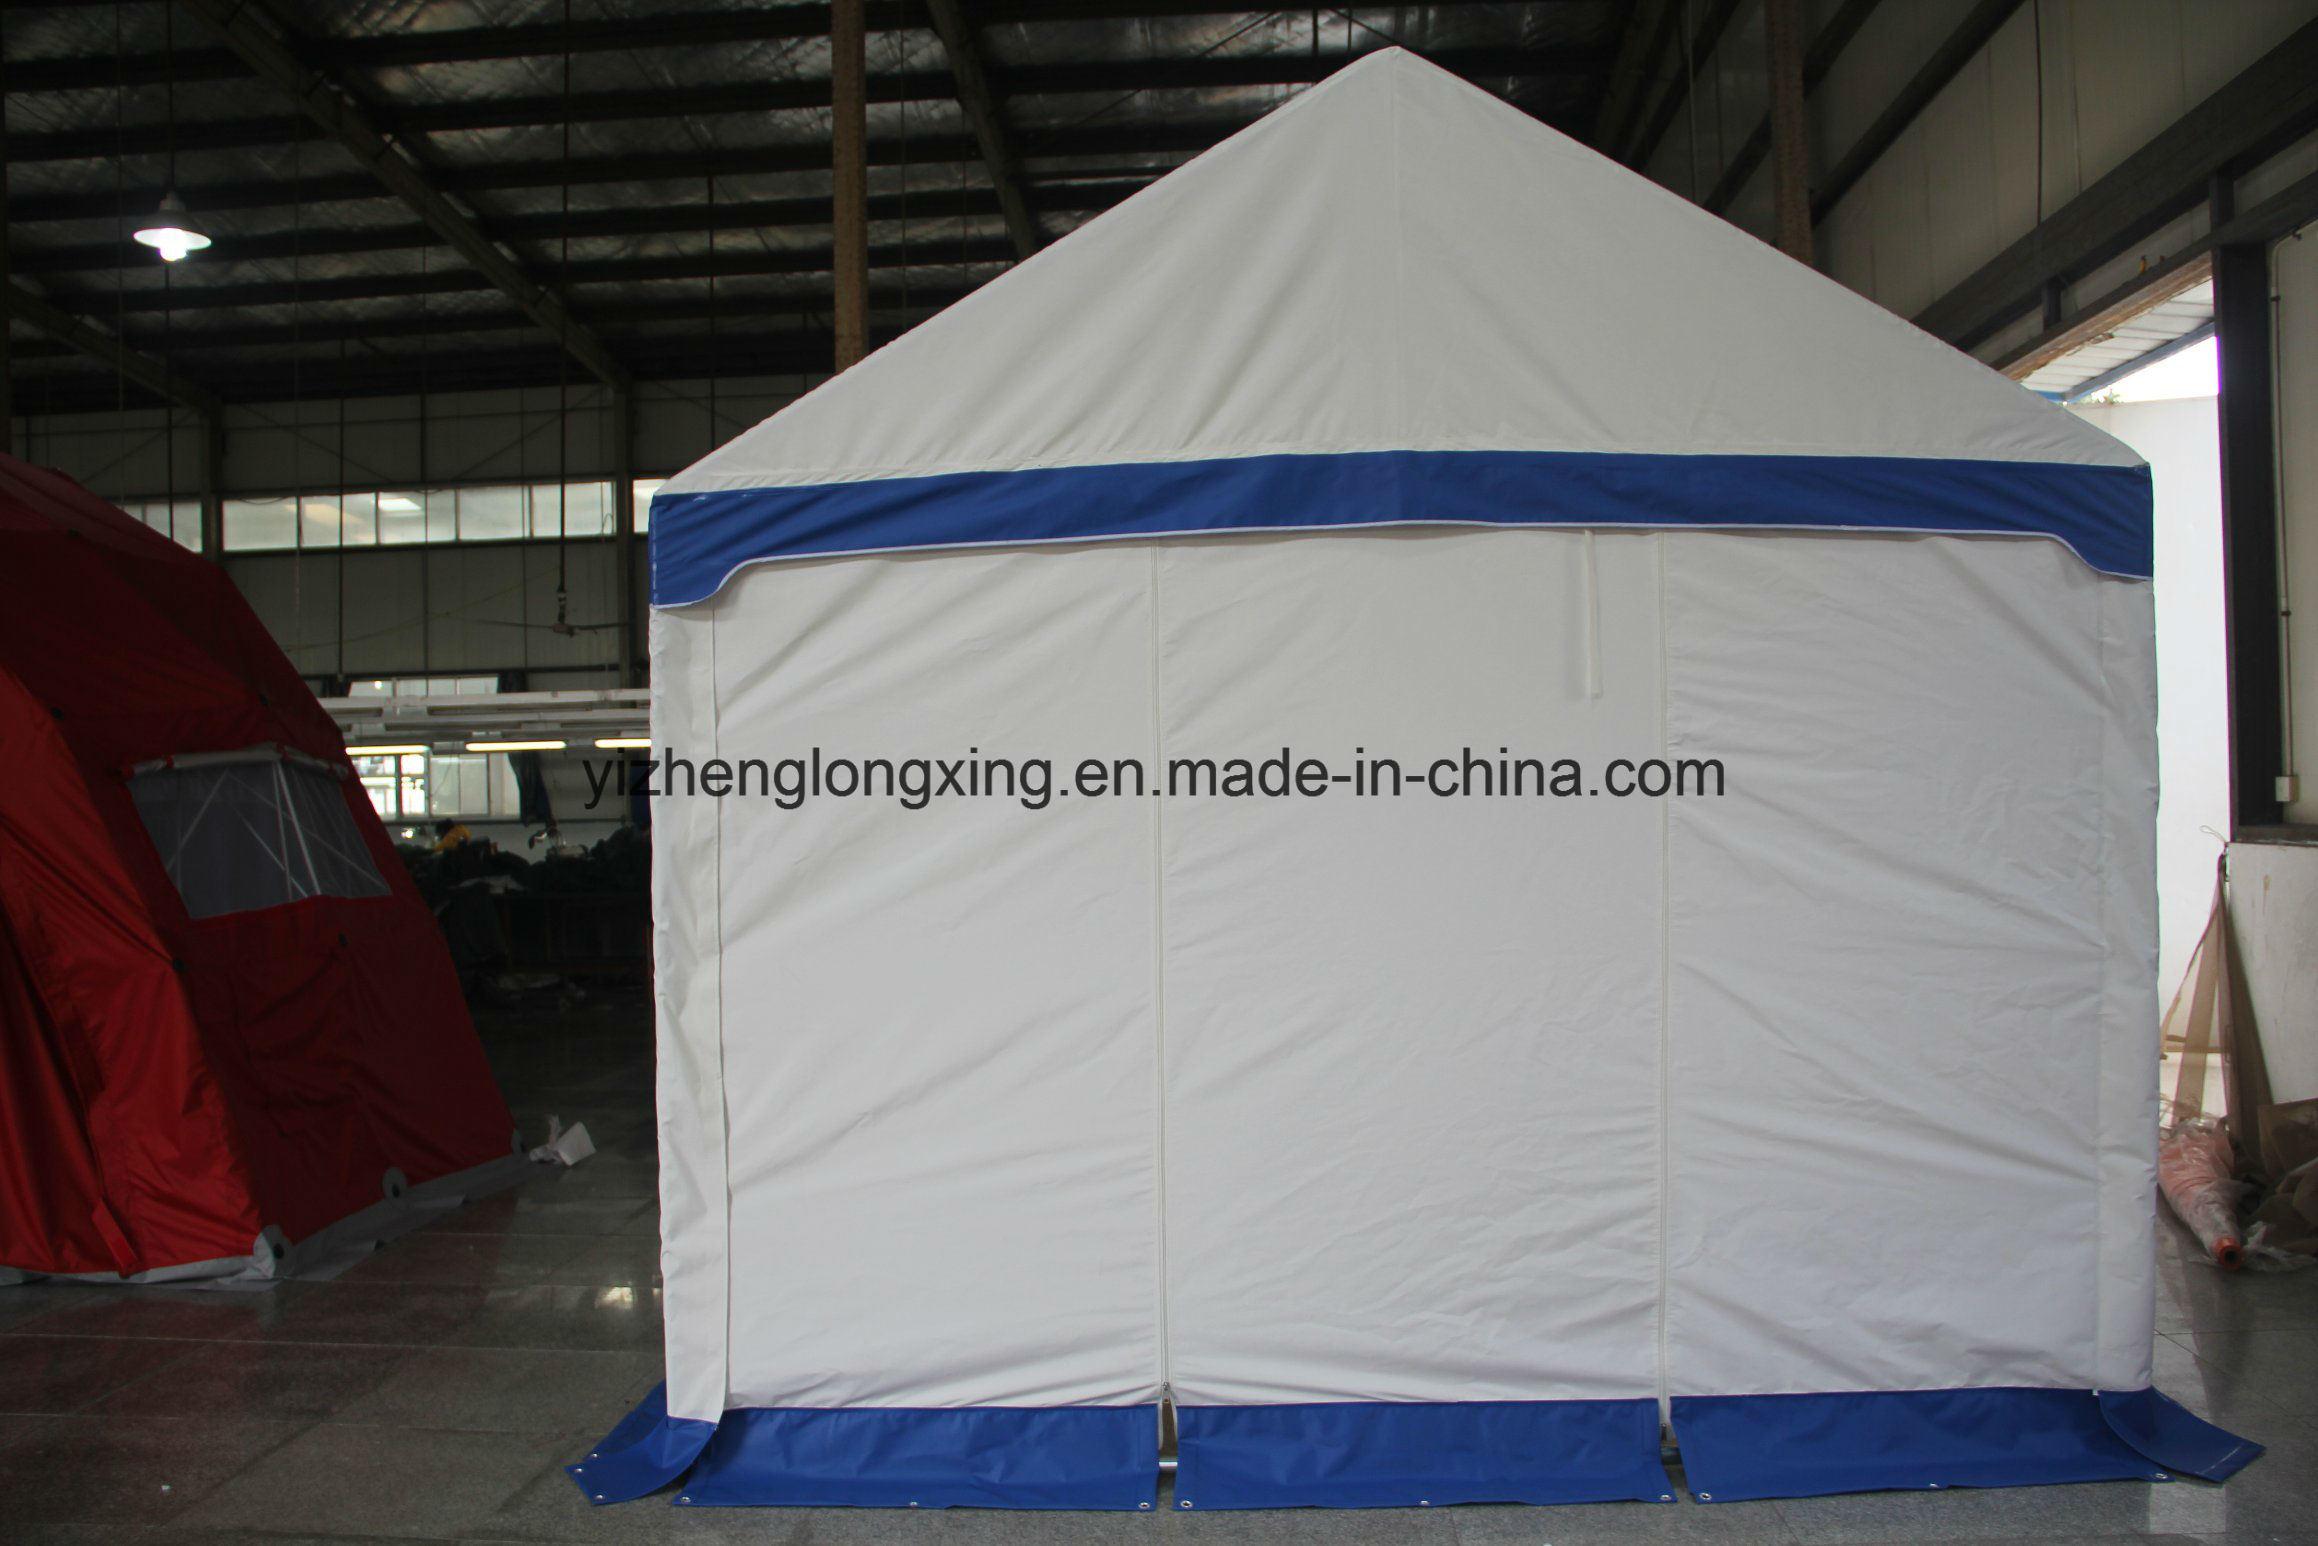 Hot Sale Professional Steel Folding Canopy Tent Pop up